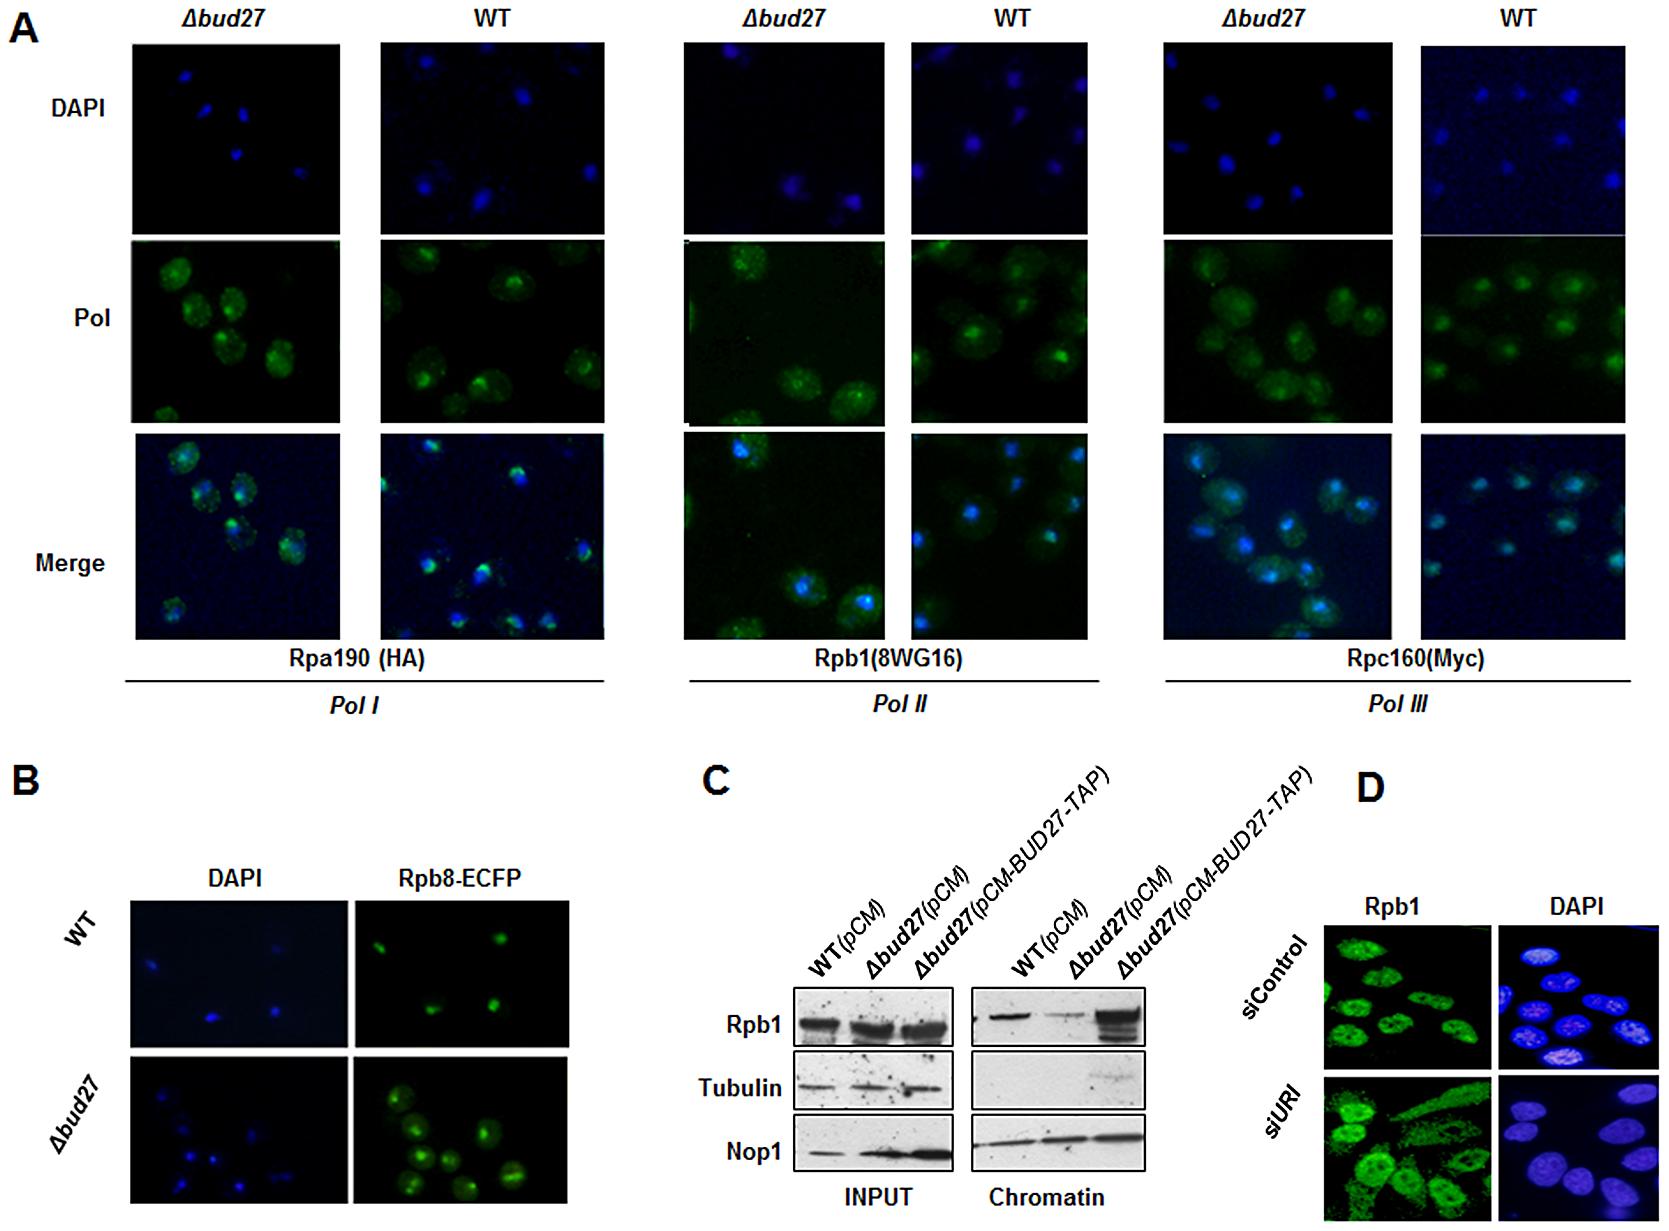 Lack of Bud27 led to RNA pol I, II, and III cytoplasmic accumulation.